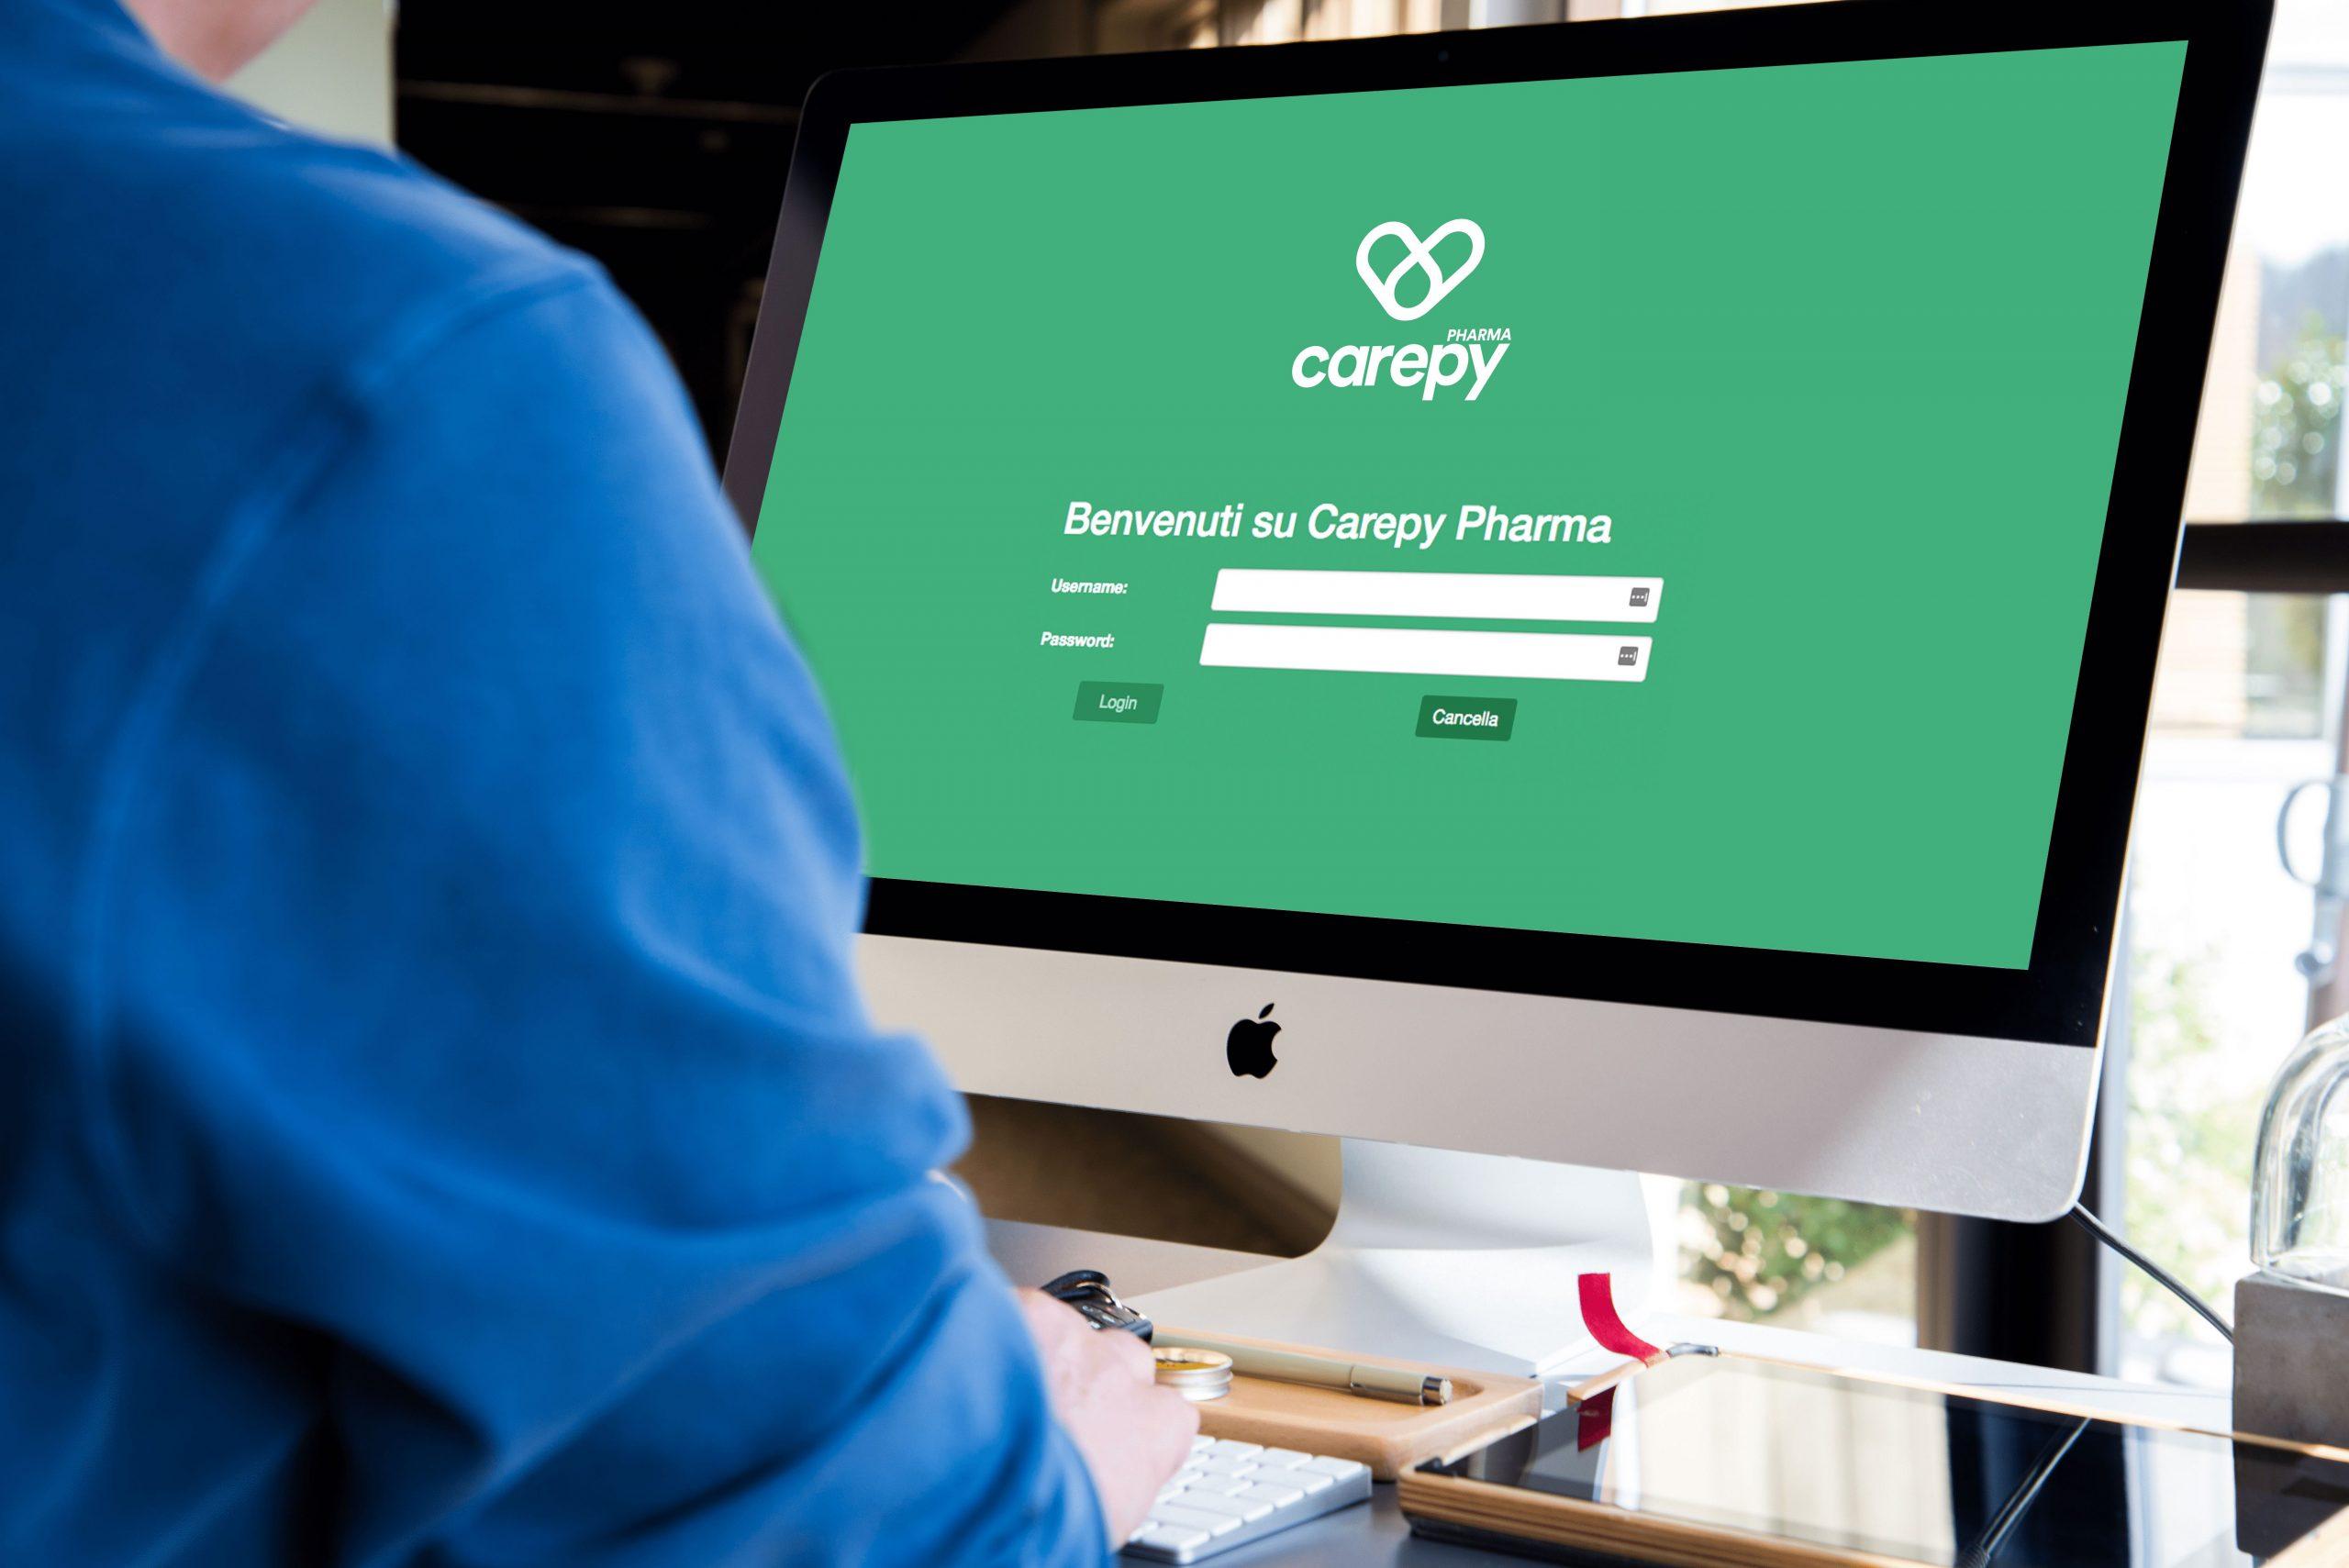 carepy-pharma-2-compressed